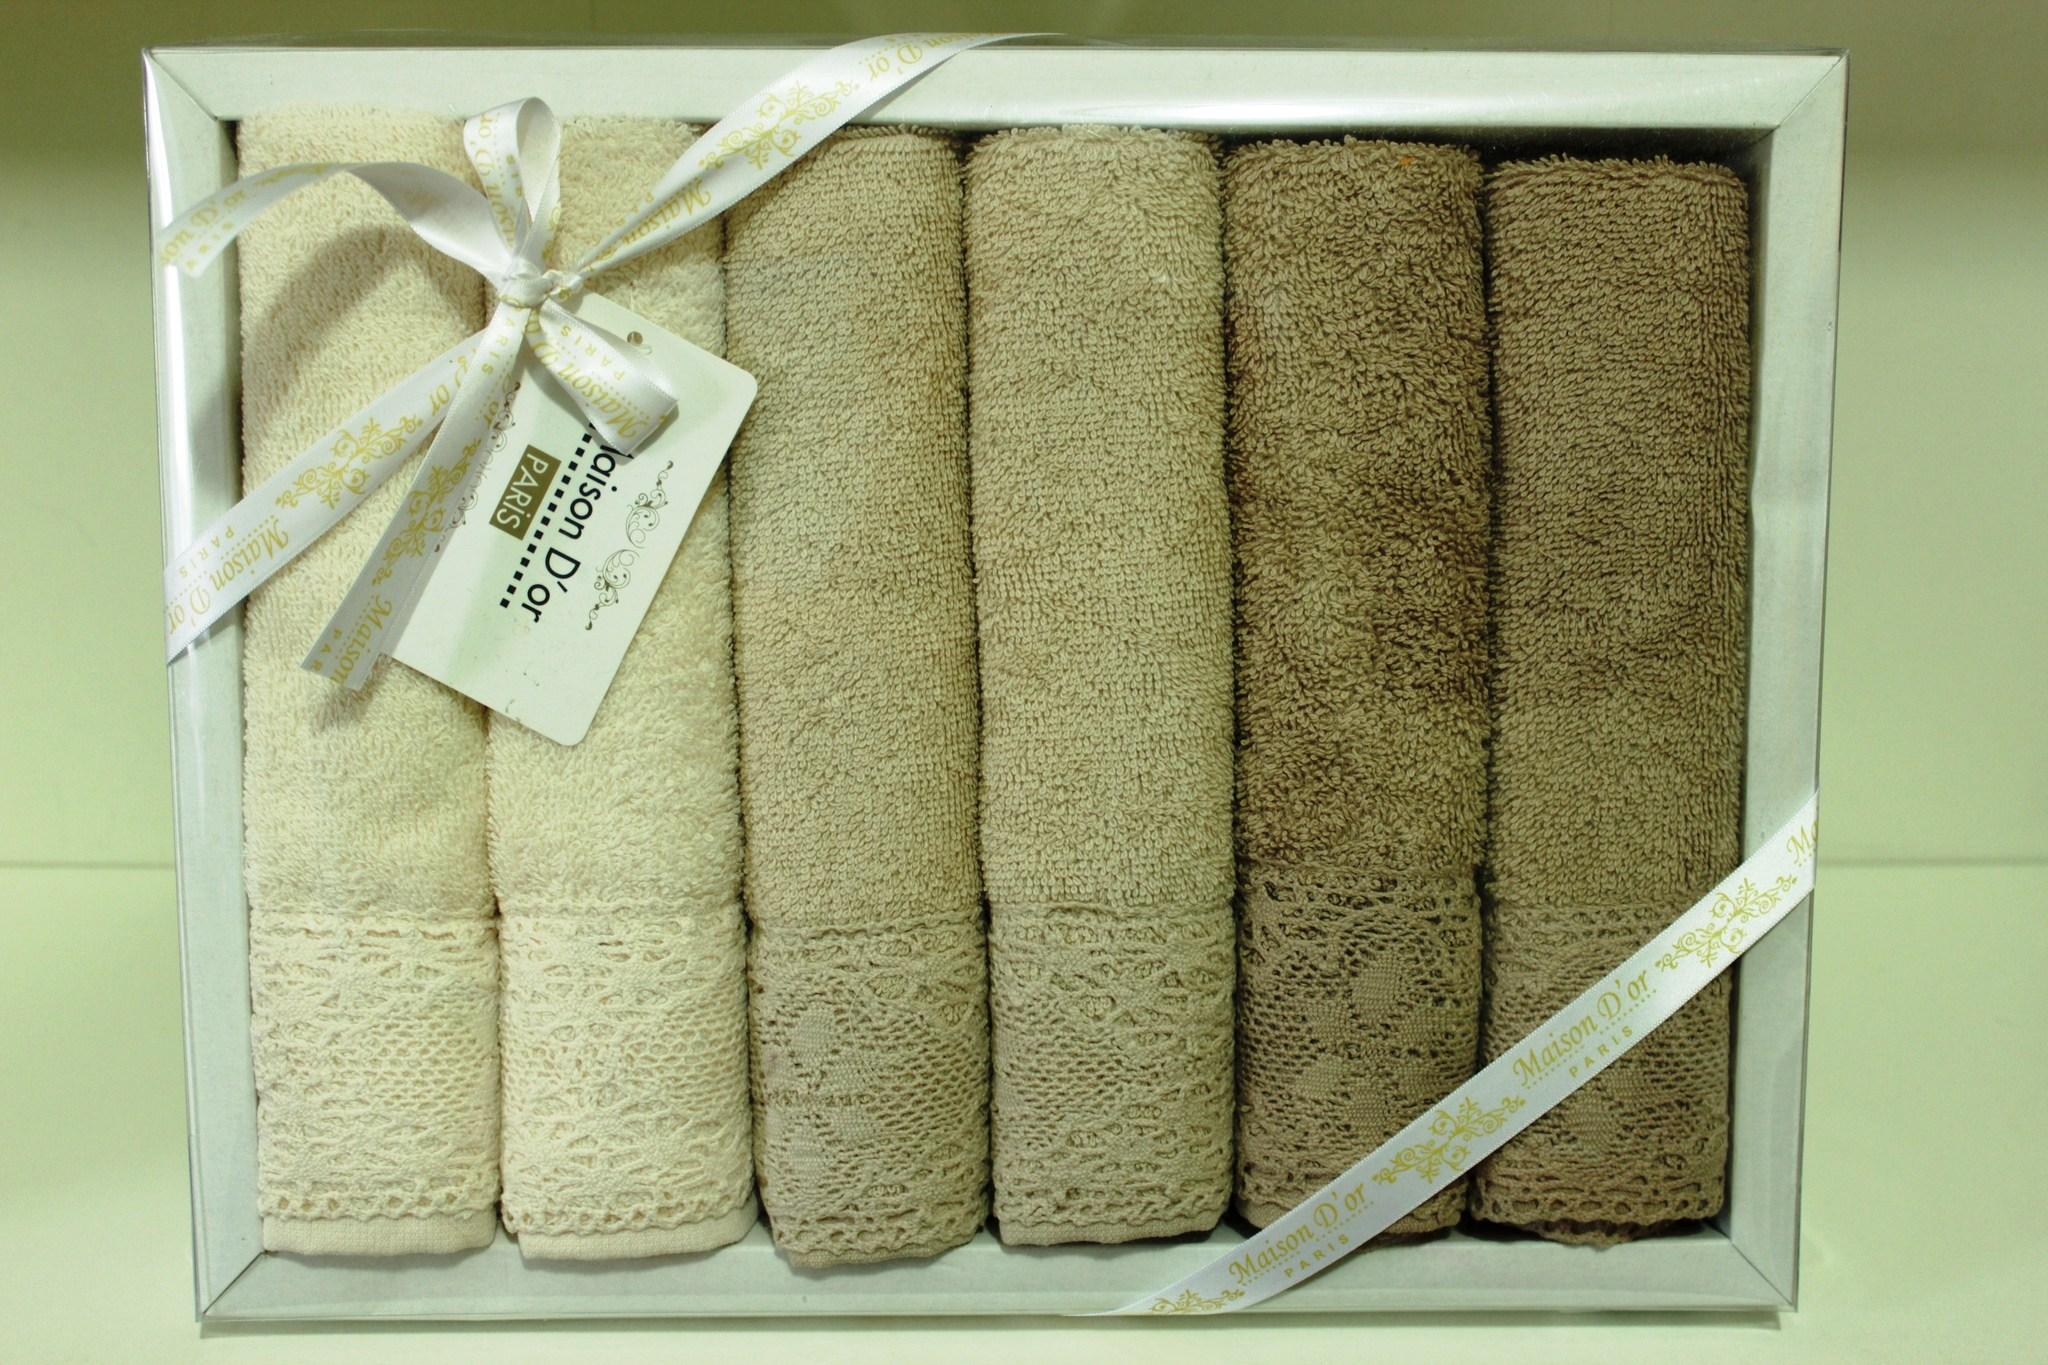 Кухонные полотенца Набор махровых салфеток NATURAL НАТУРАЛ   32х50  Maison Dor (Турция) NATURAL.JPG